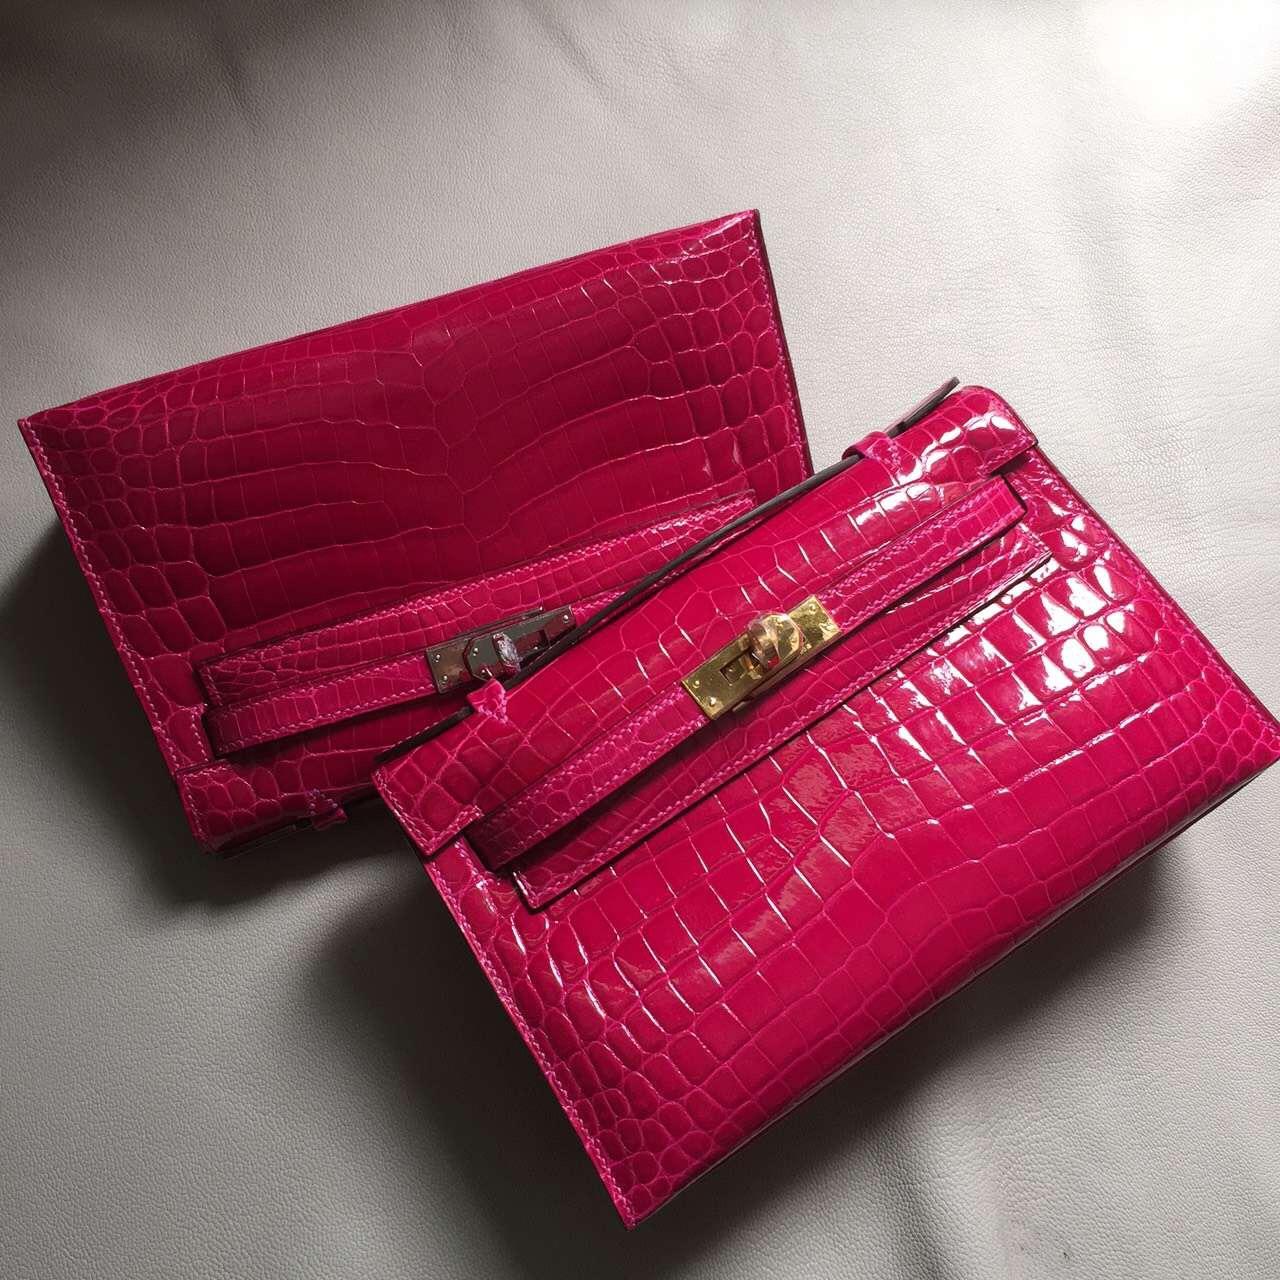 Hermes J5 Rose Scheherazade Crocodile Shiny Leather Minikelly Clutch Bag 22CM